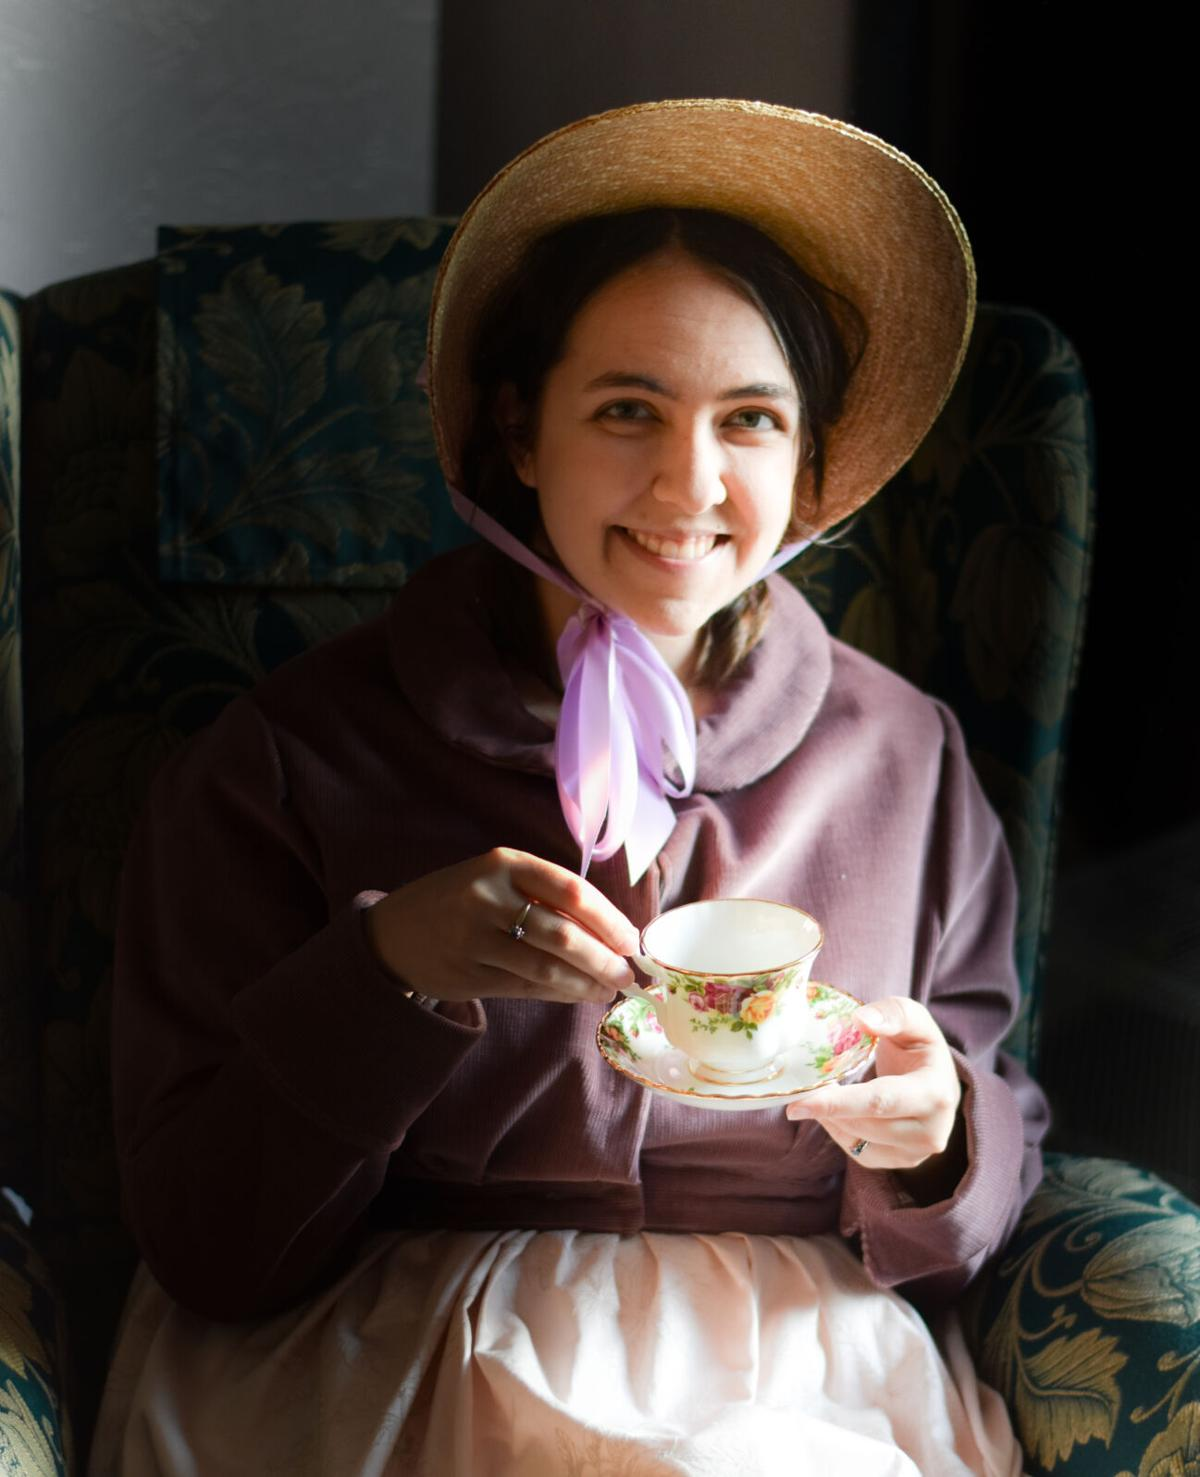 Ellis as Jane Austen